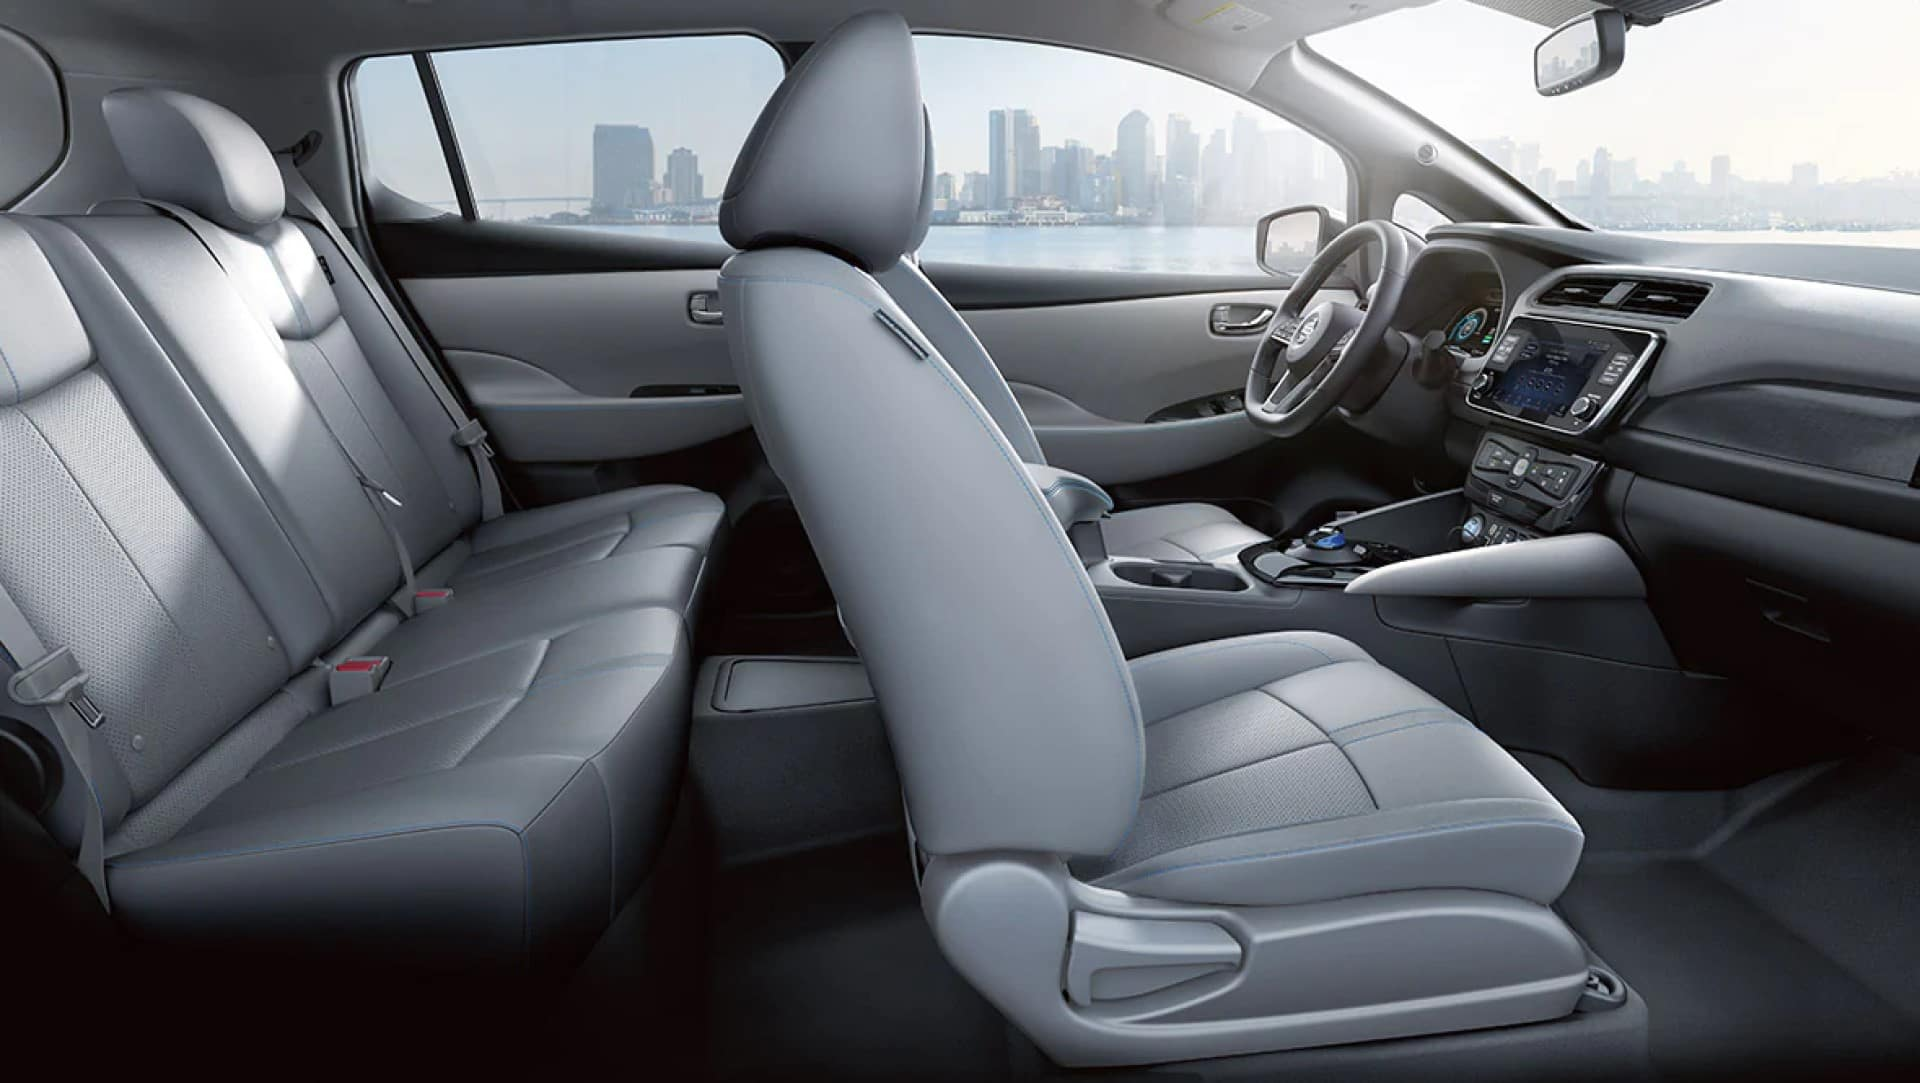 Nissan_LEAF_Cabin_Space